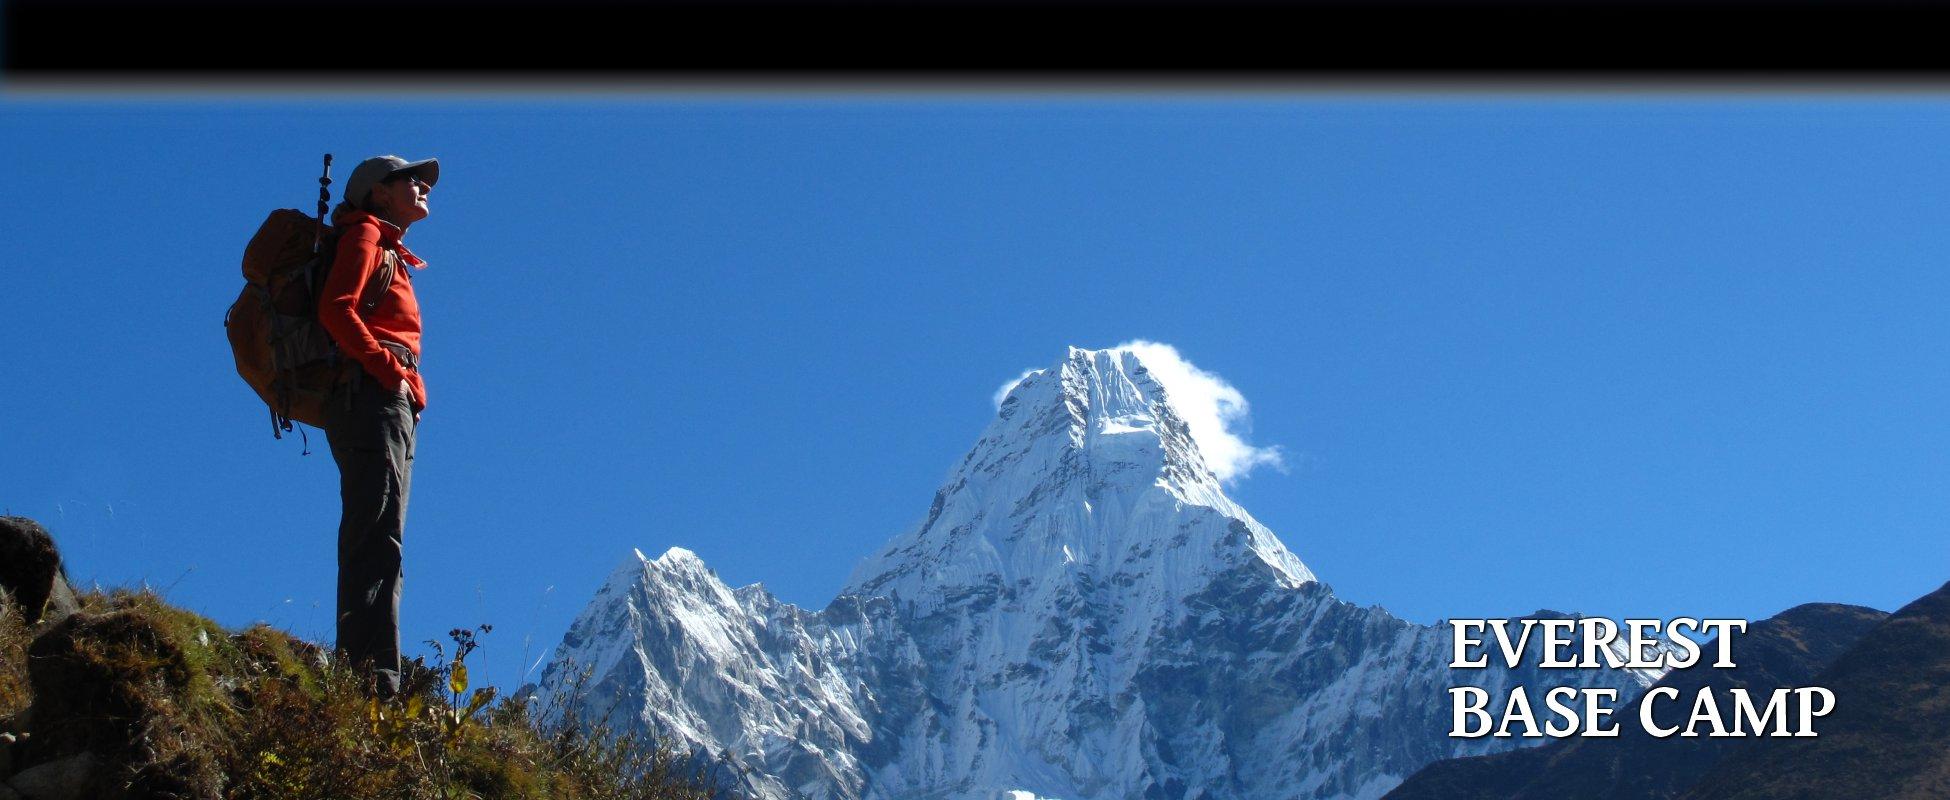 Everest Base Camp Trek Dates & Prices